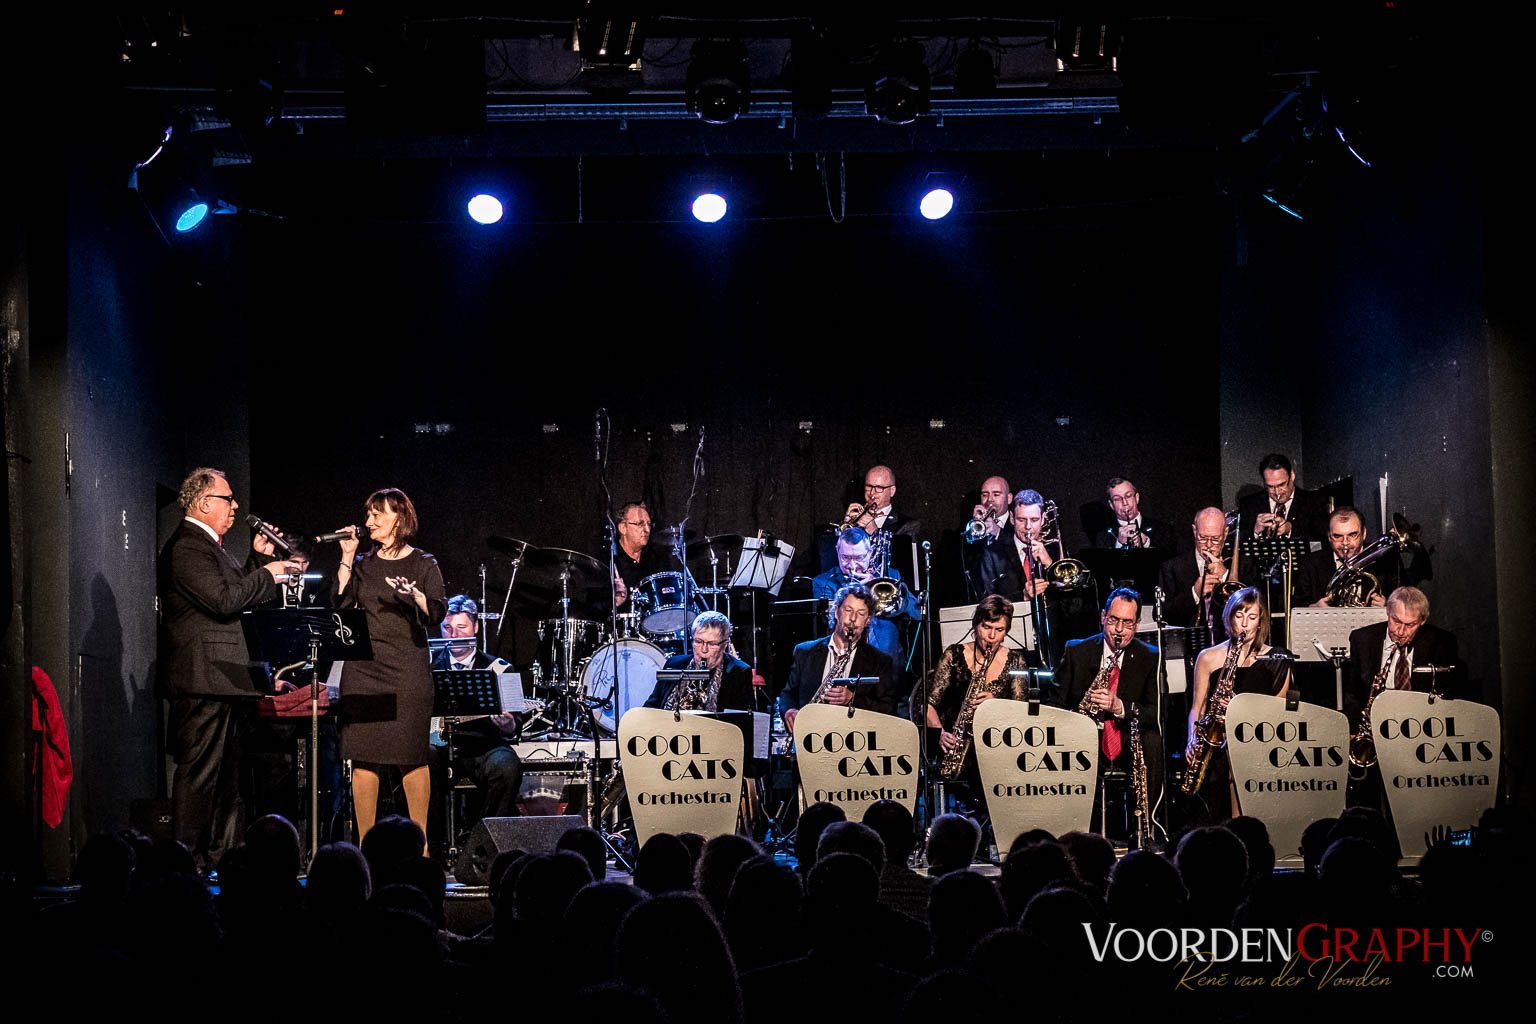 2017 Cool Cats Orchestra @ Rhein-Neckar-Theater